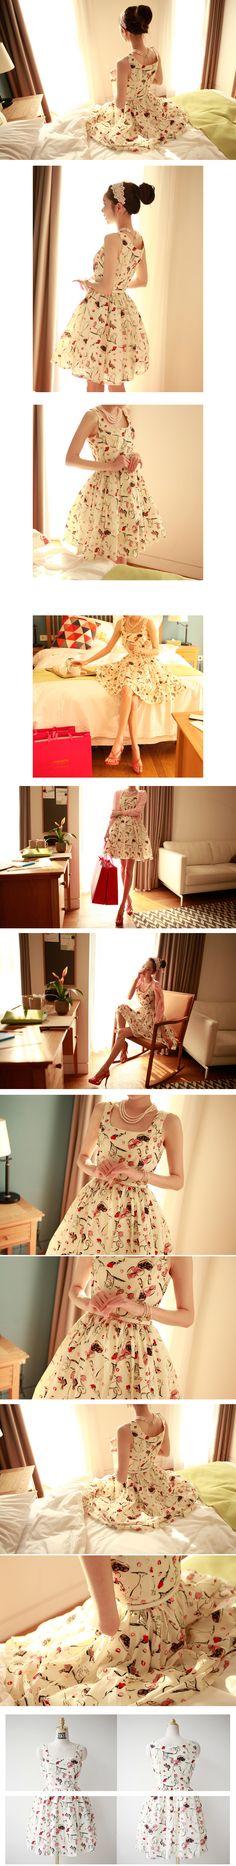 chic-su) メイクアップワンピース【当日発送可】★4次入荷 - 韓国ファッション通販【セレクトショップKii-Na】キーナ